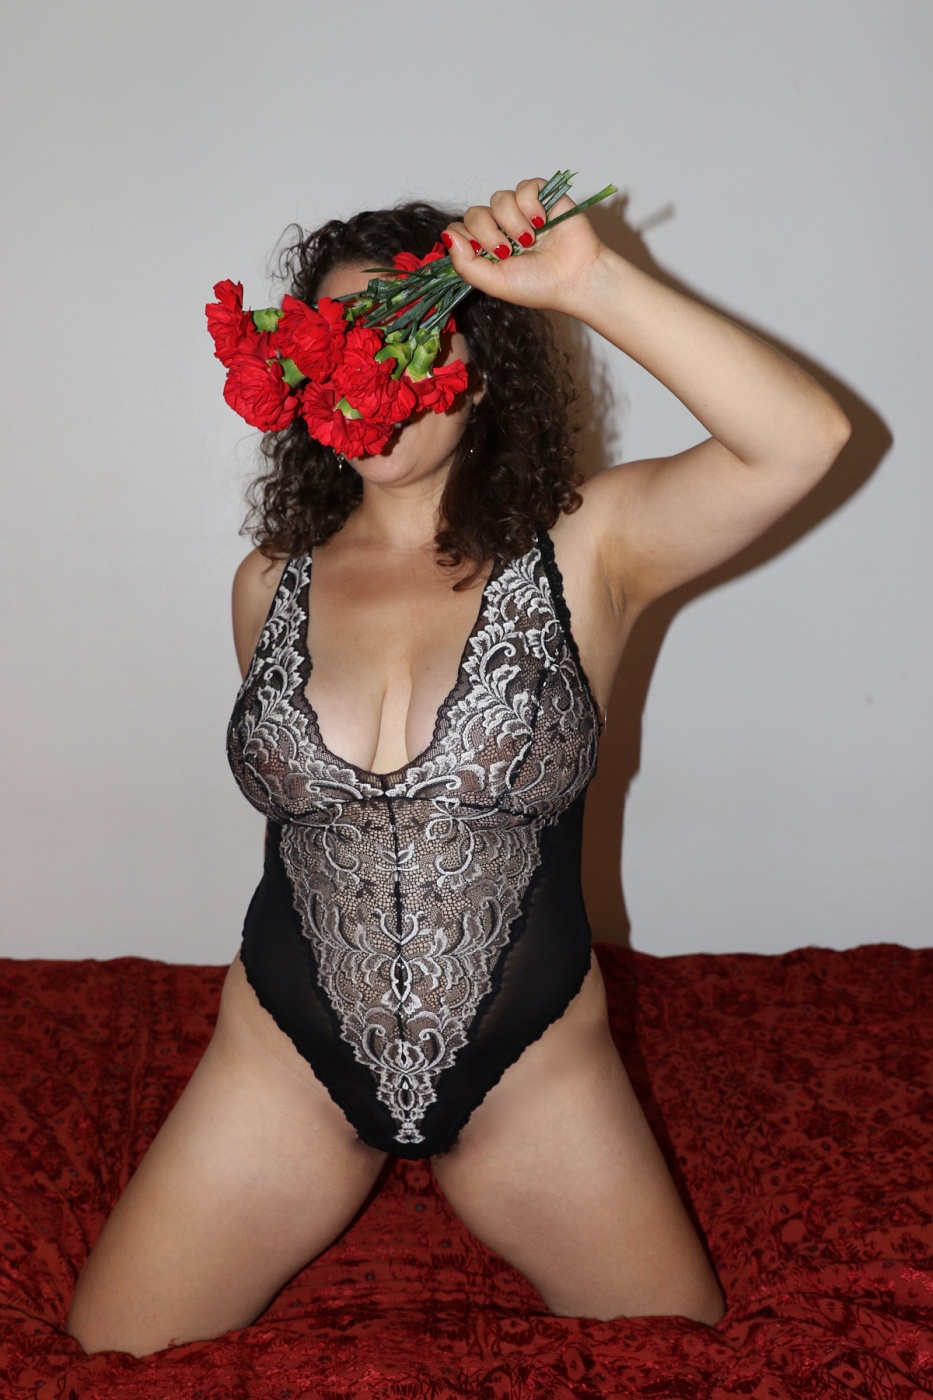 Adrienne Wood